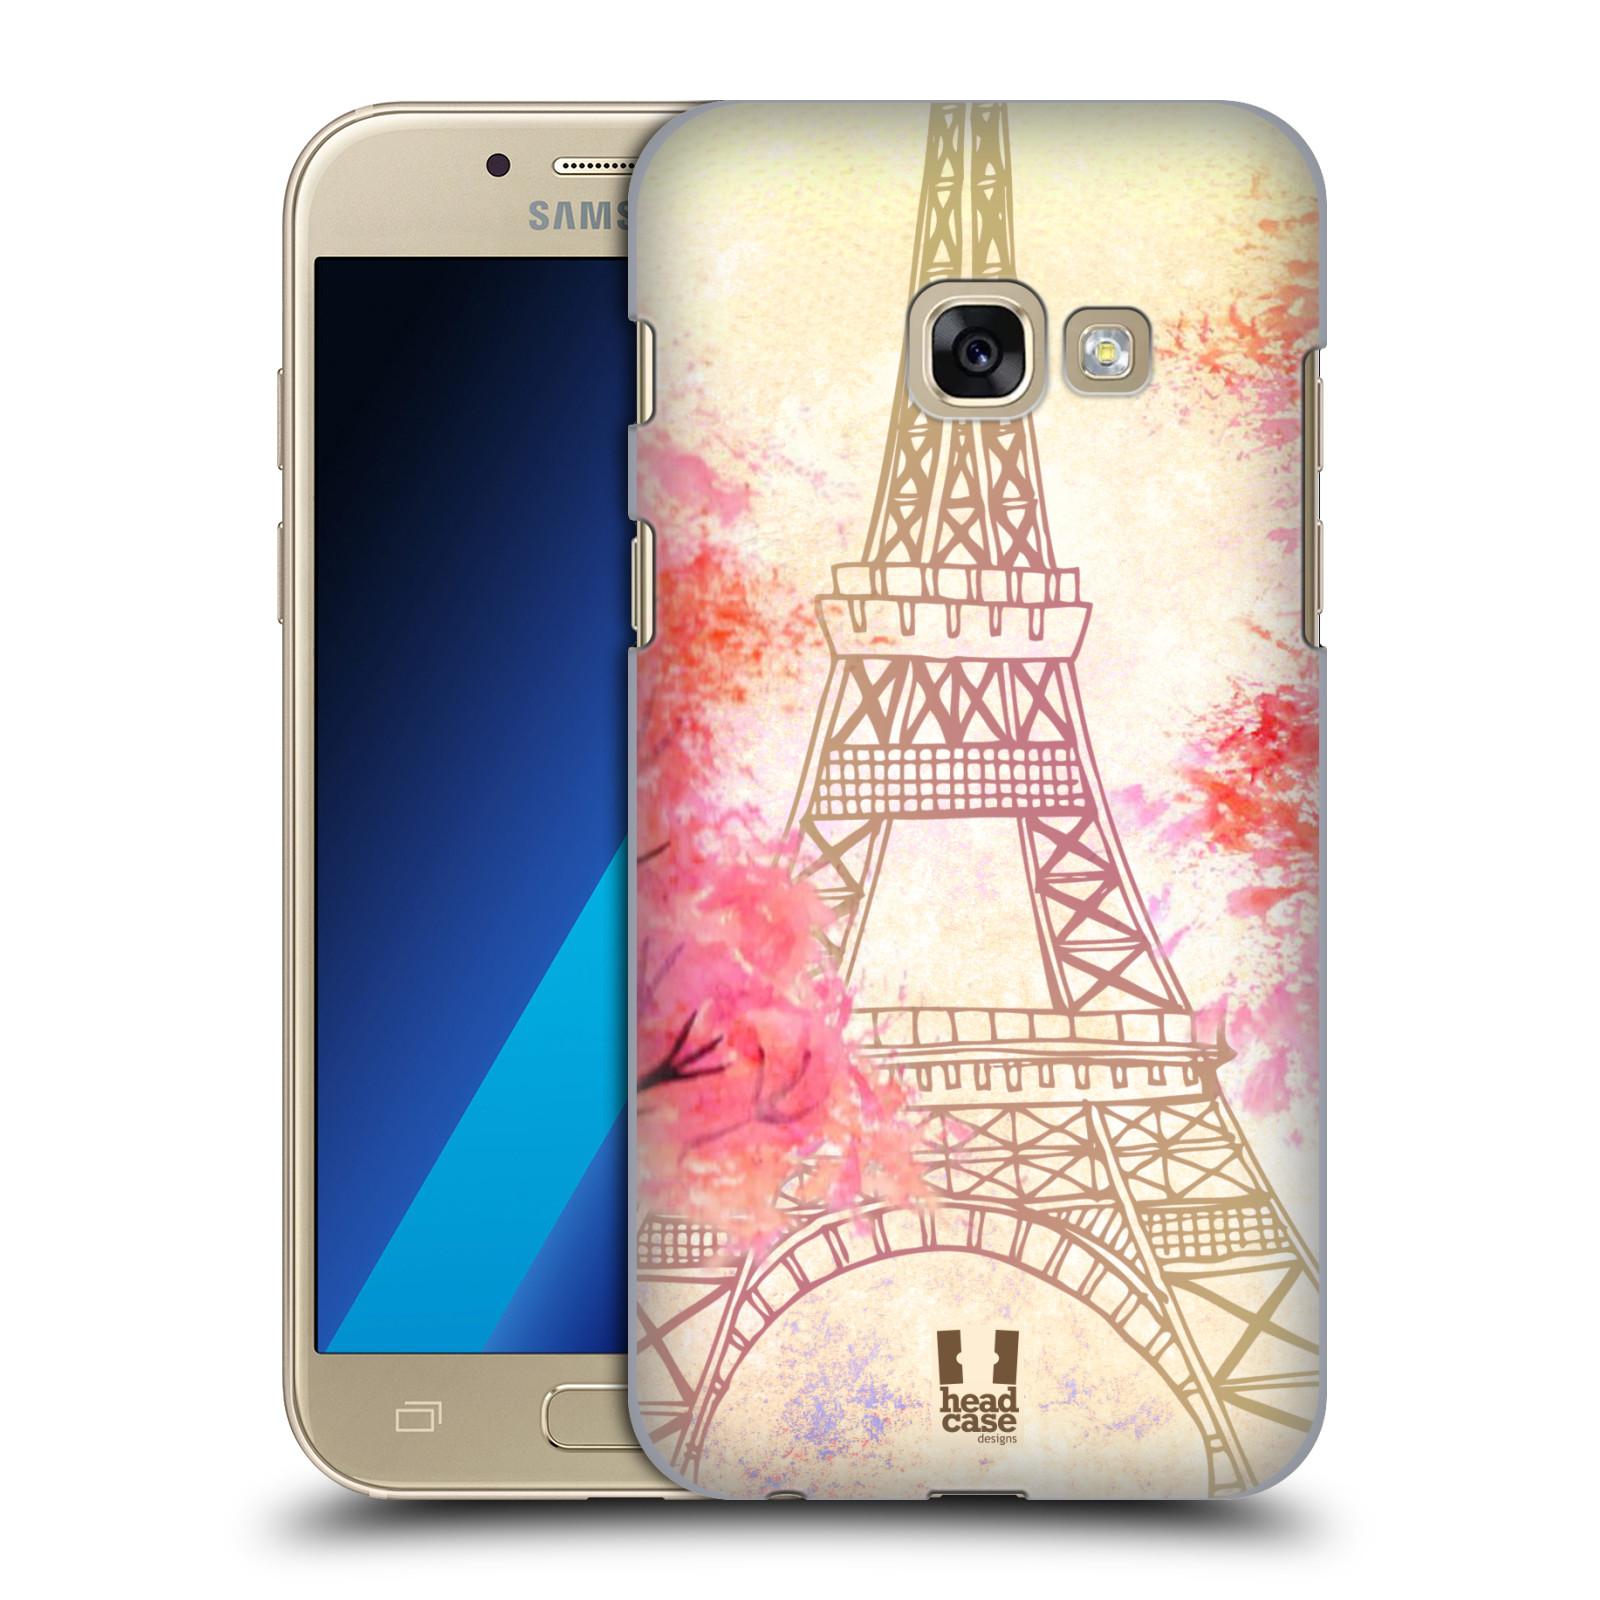 HEAD-CASE-DESIGNS-I-DREAM-OF-PARIS-HARD-BACK-CASE-FOR-SAMSUNG-GALAXY-A3-2017